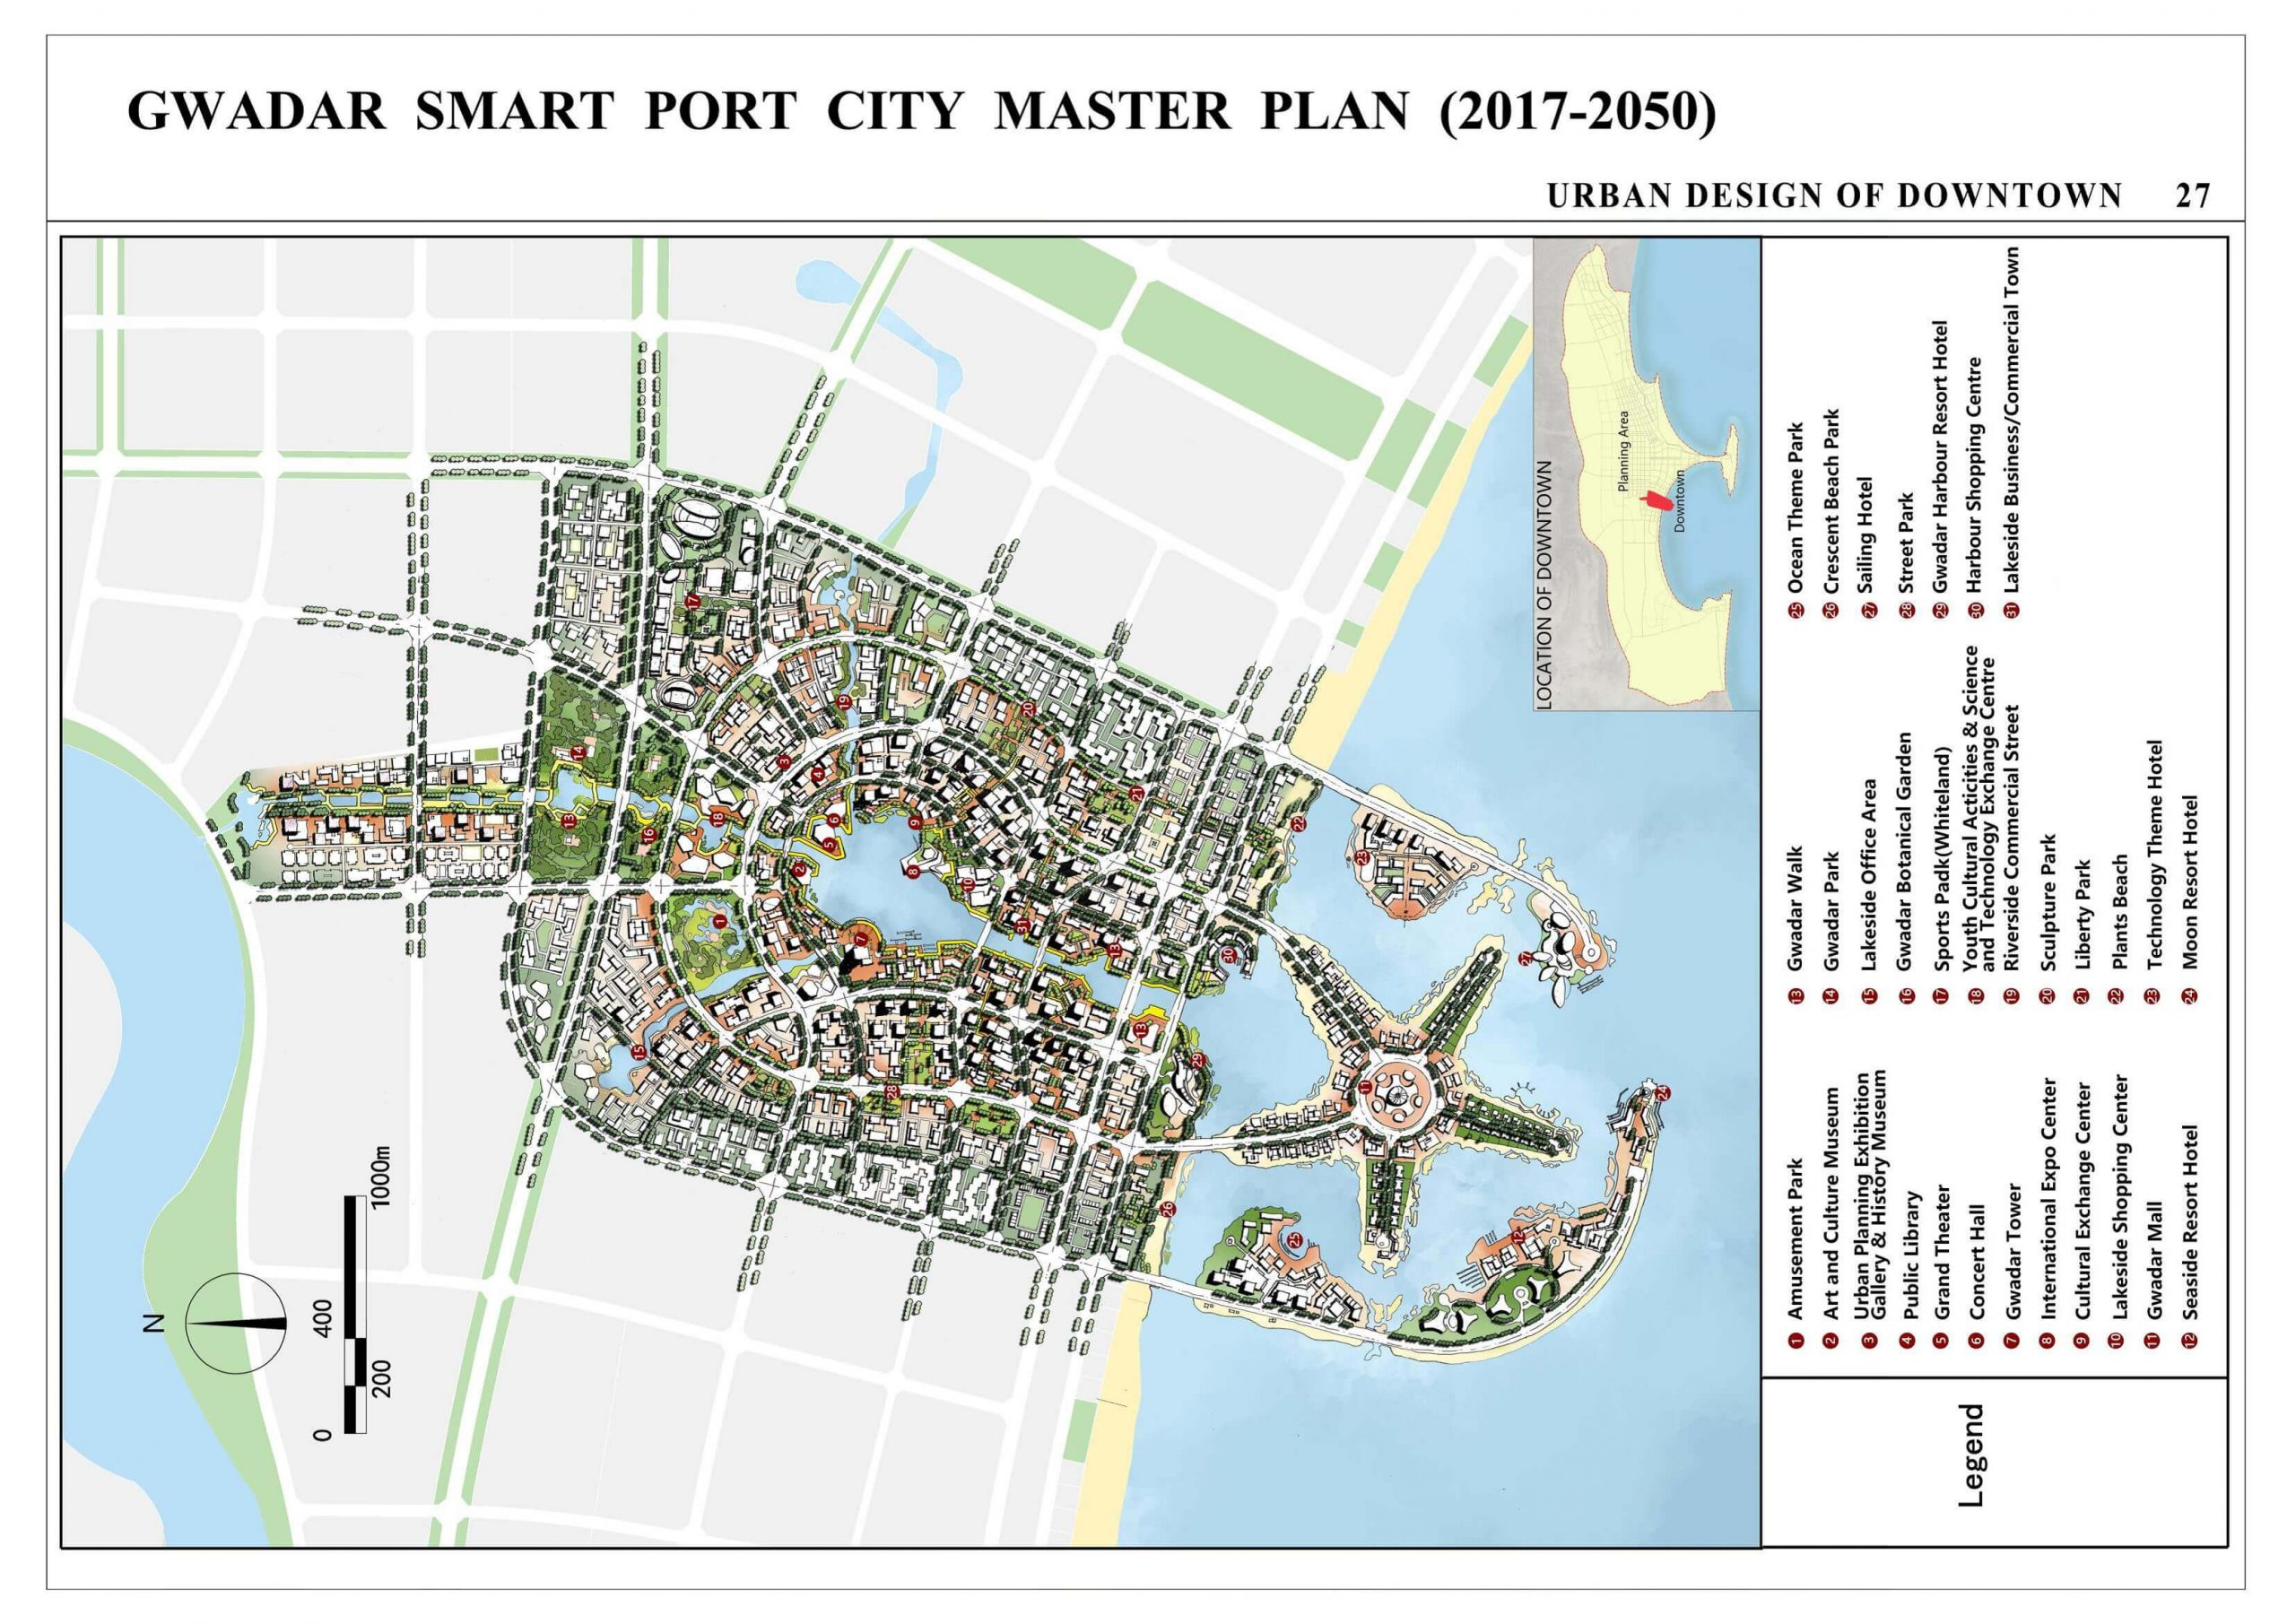 Gwadar smart city plan with map